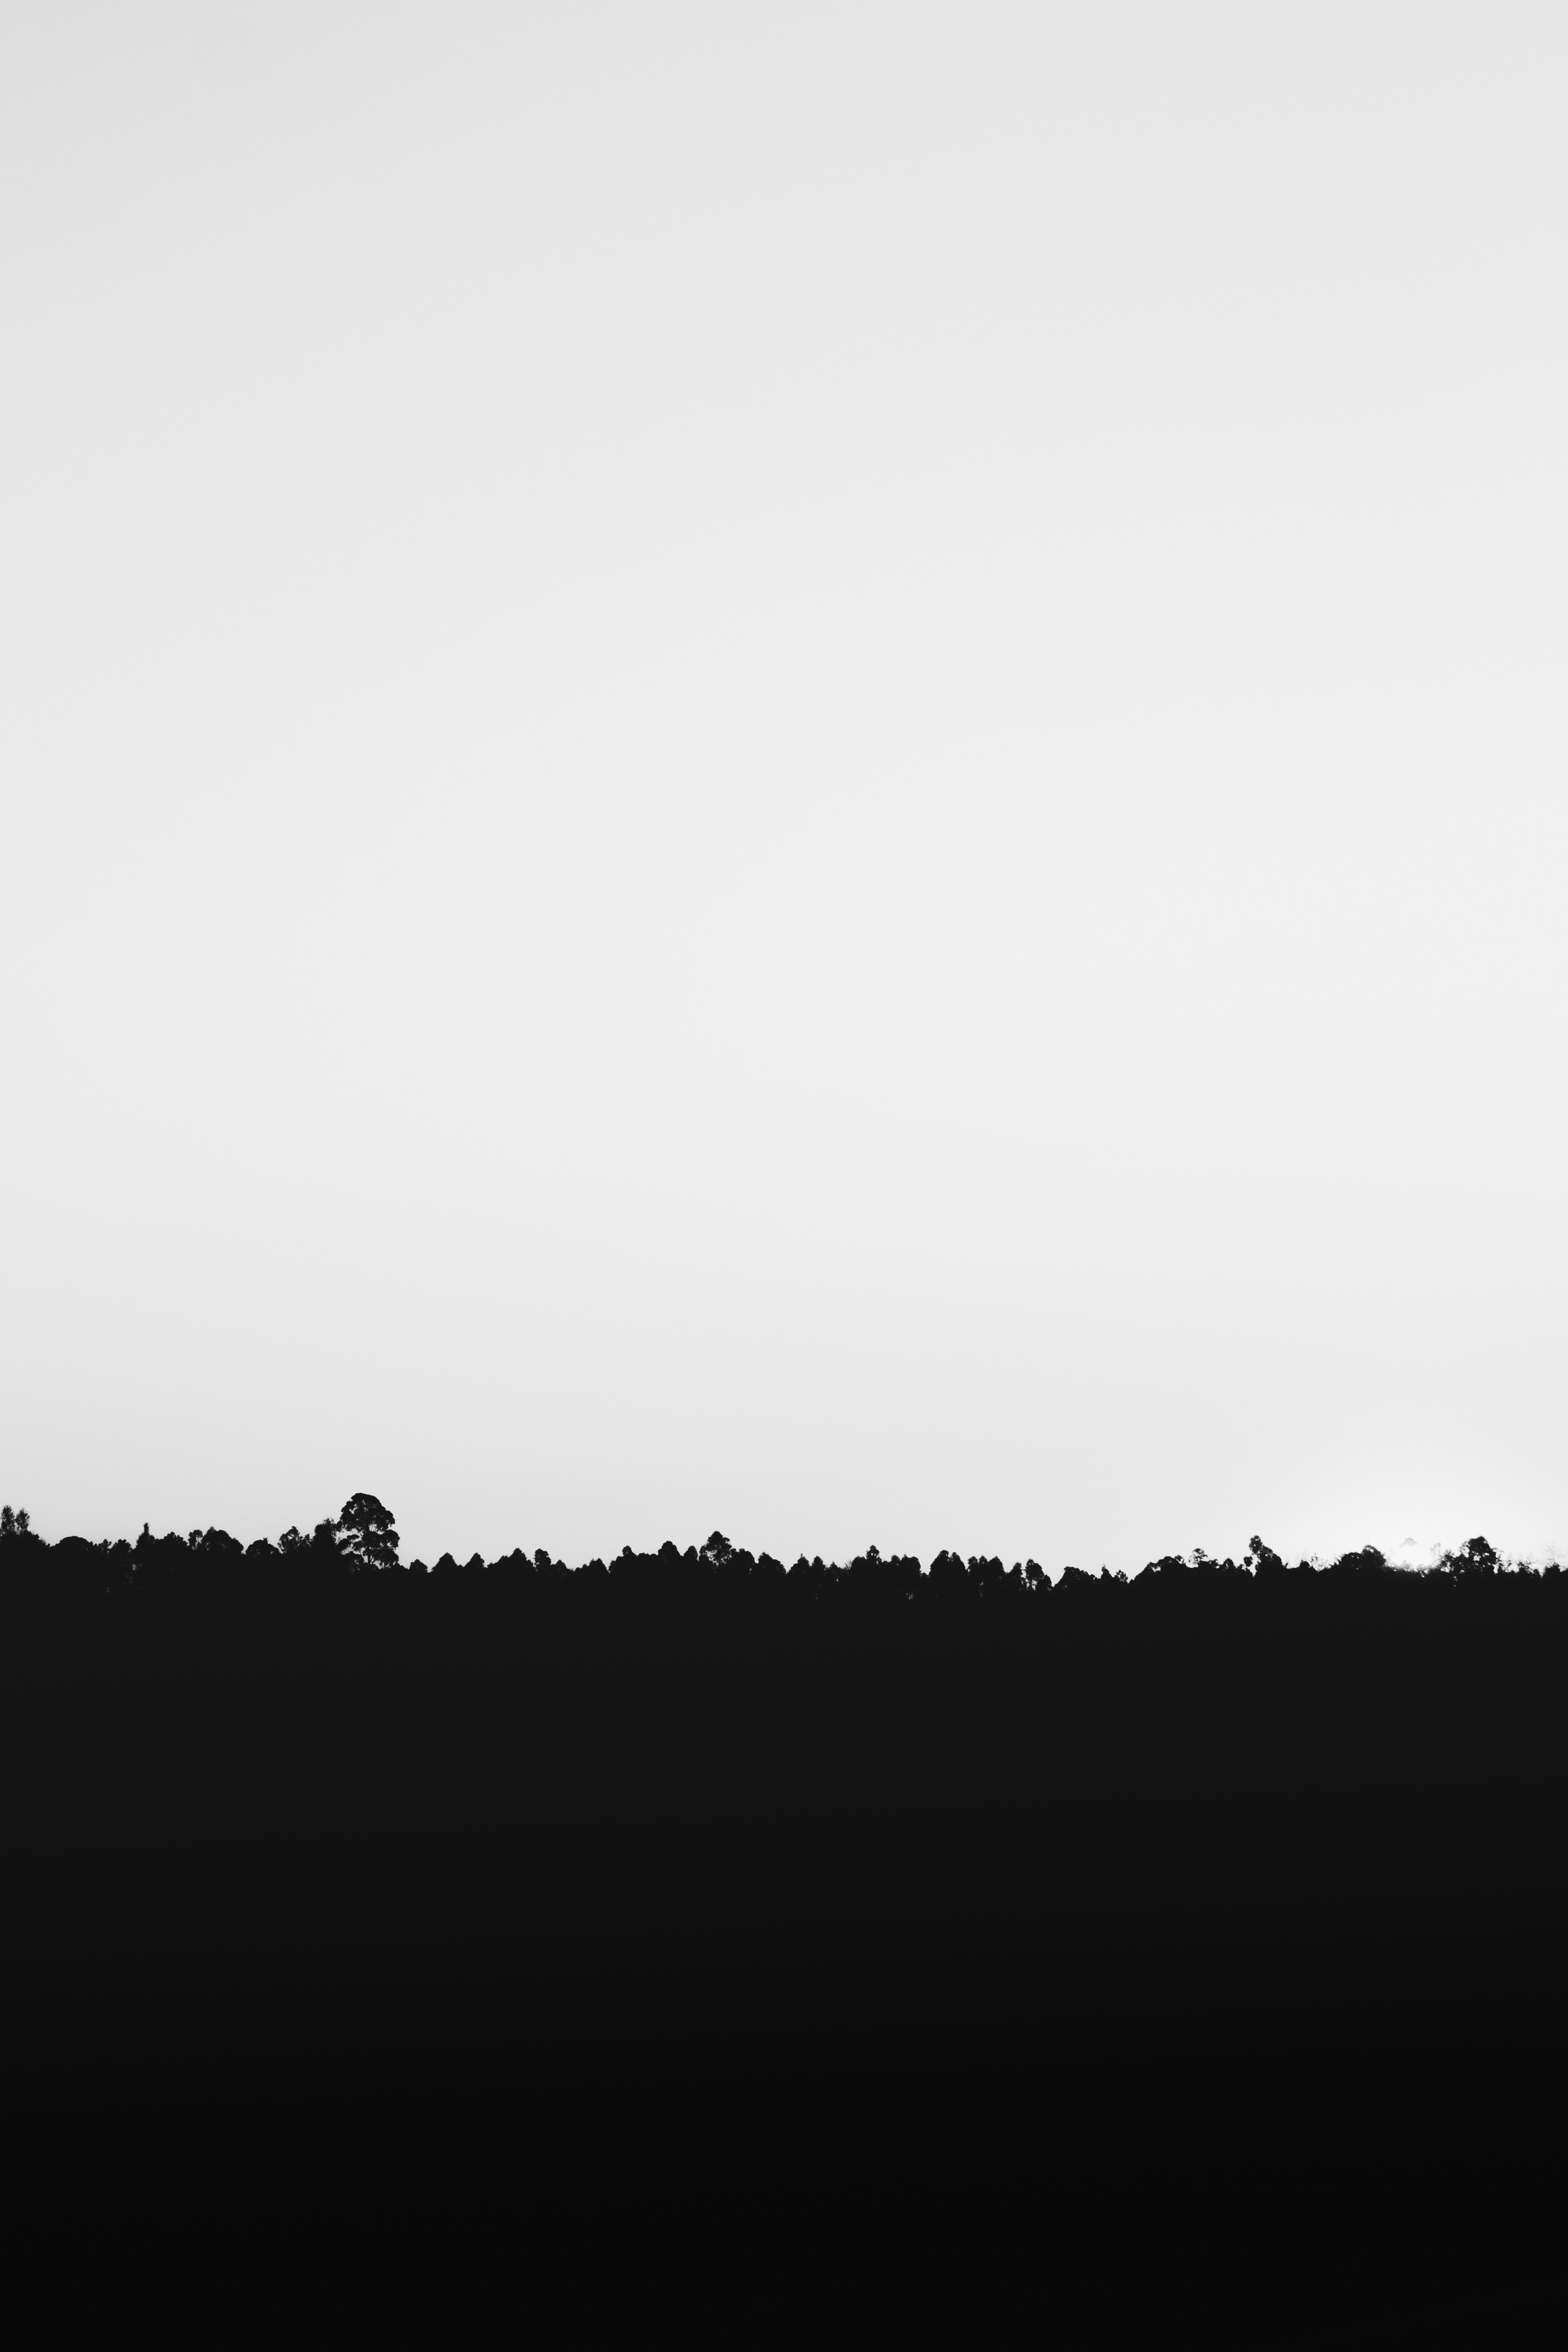 Silhouette of grass under white sky photo